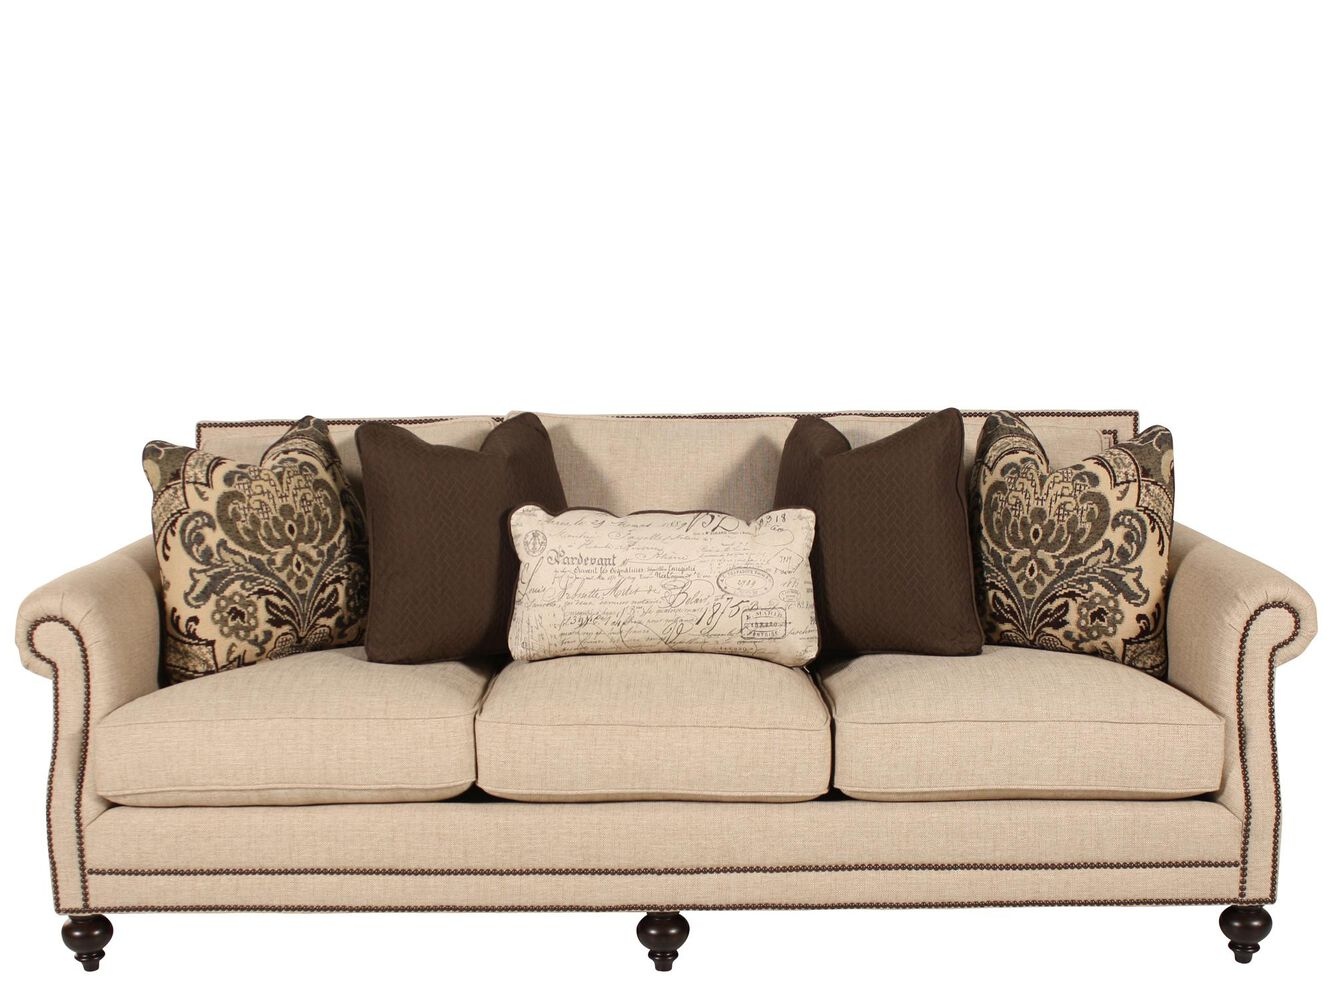 Bernhardt brae sofa mathis brothers furniture for Mathis brothers living room furniture